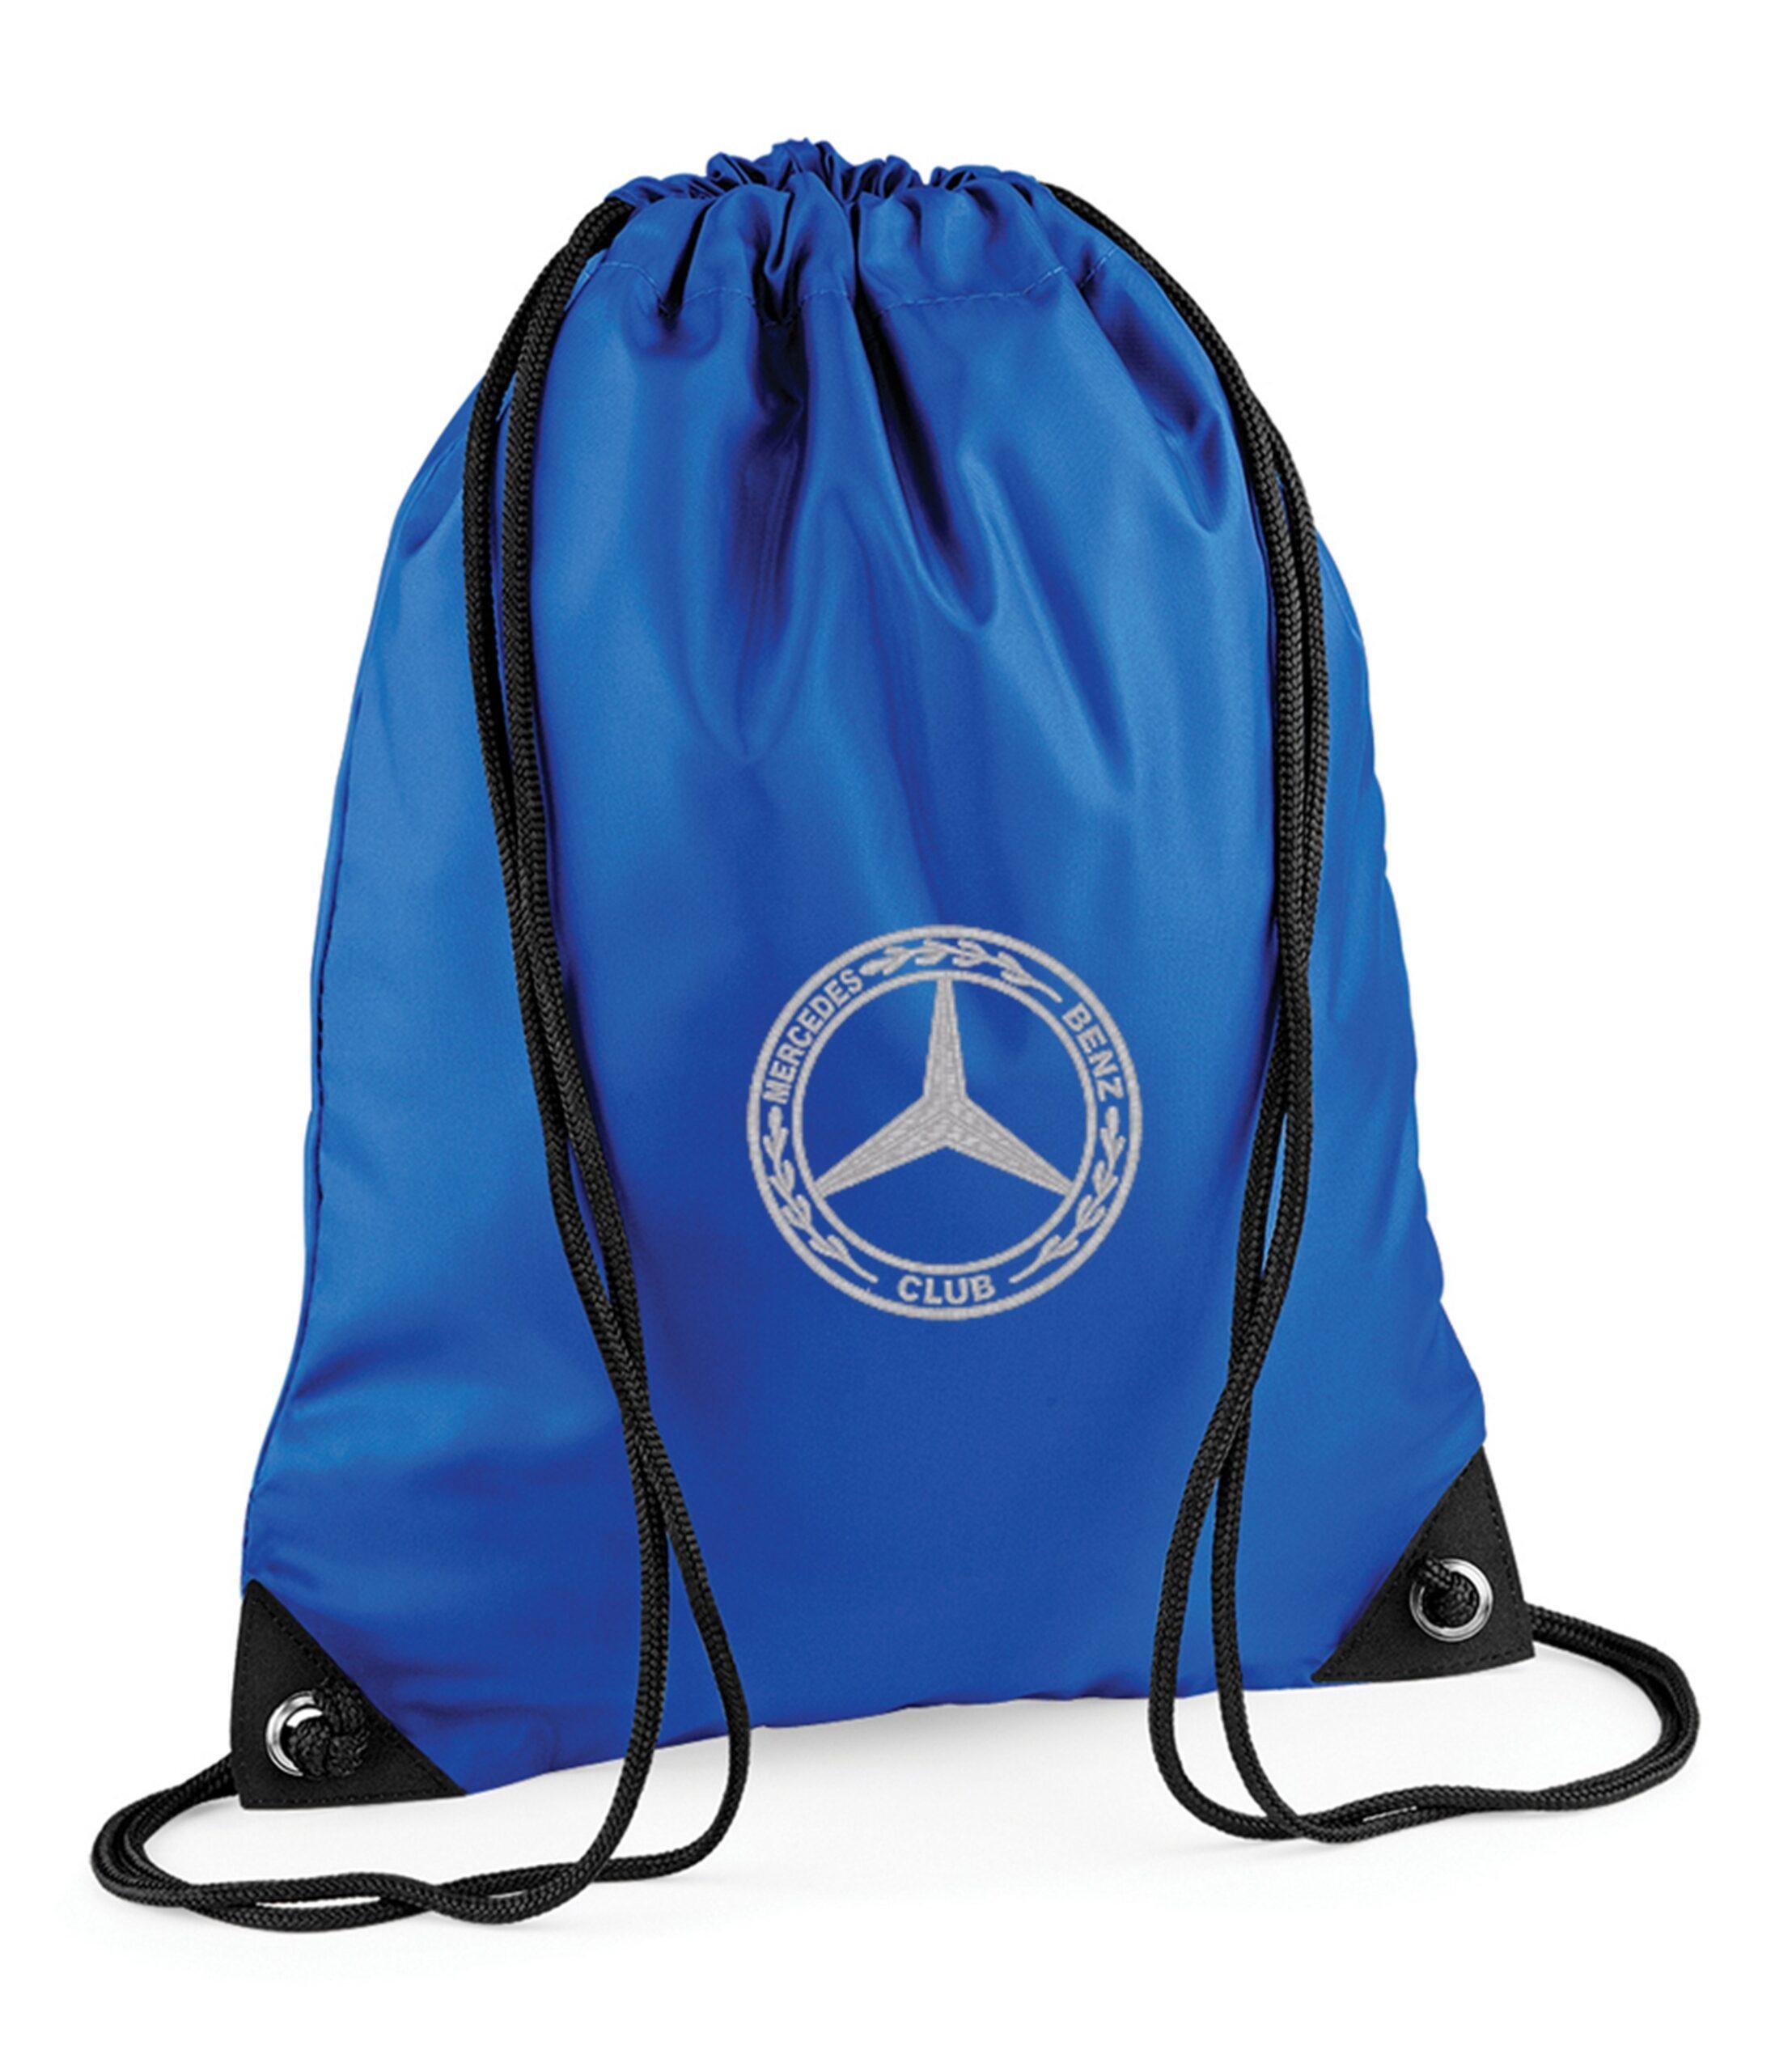 Mercedes Benz Gym Sac Blue